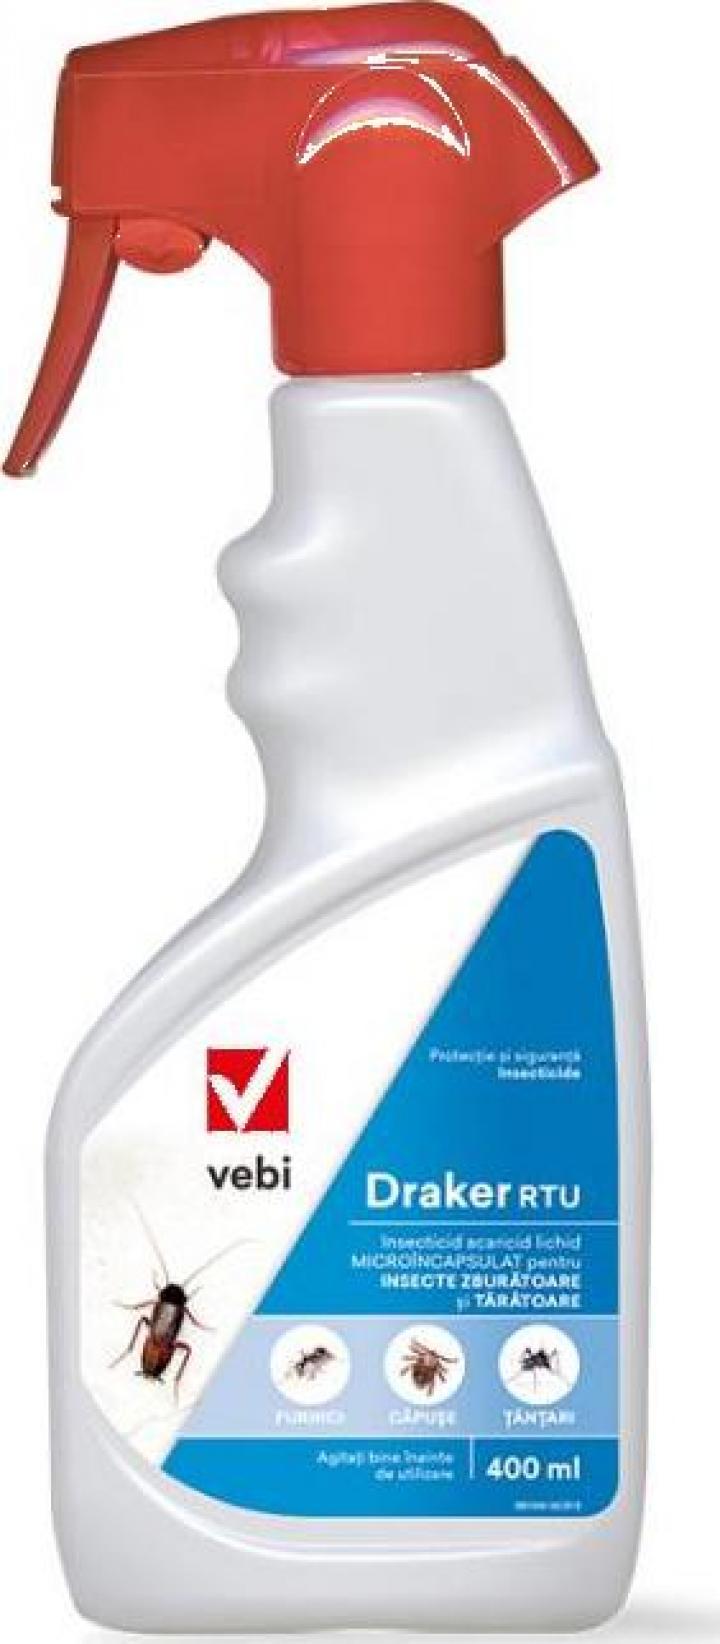 Insecticid Draker RTU 400 ml